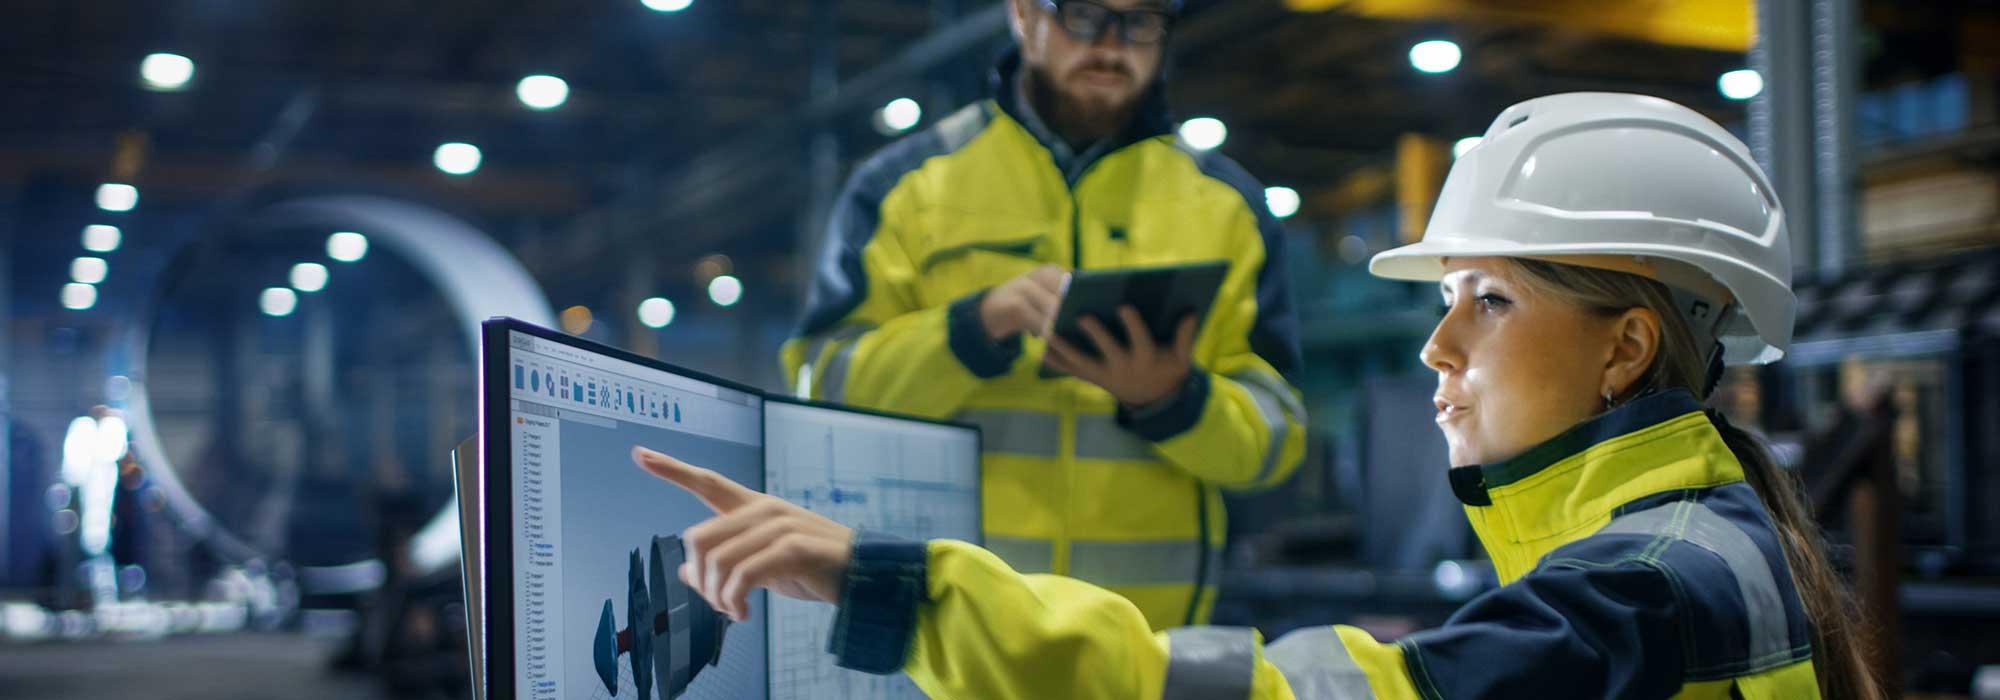 to industriarbeidere foran pc og med en laptop